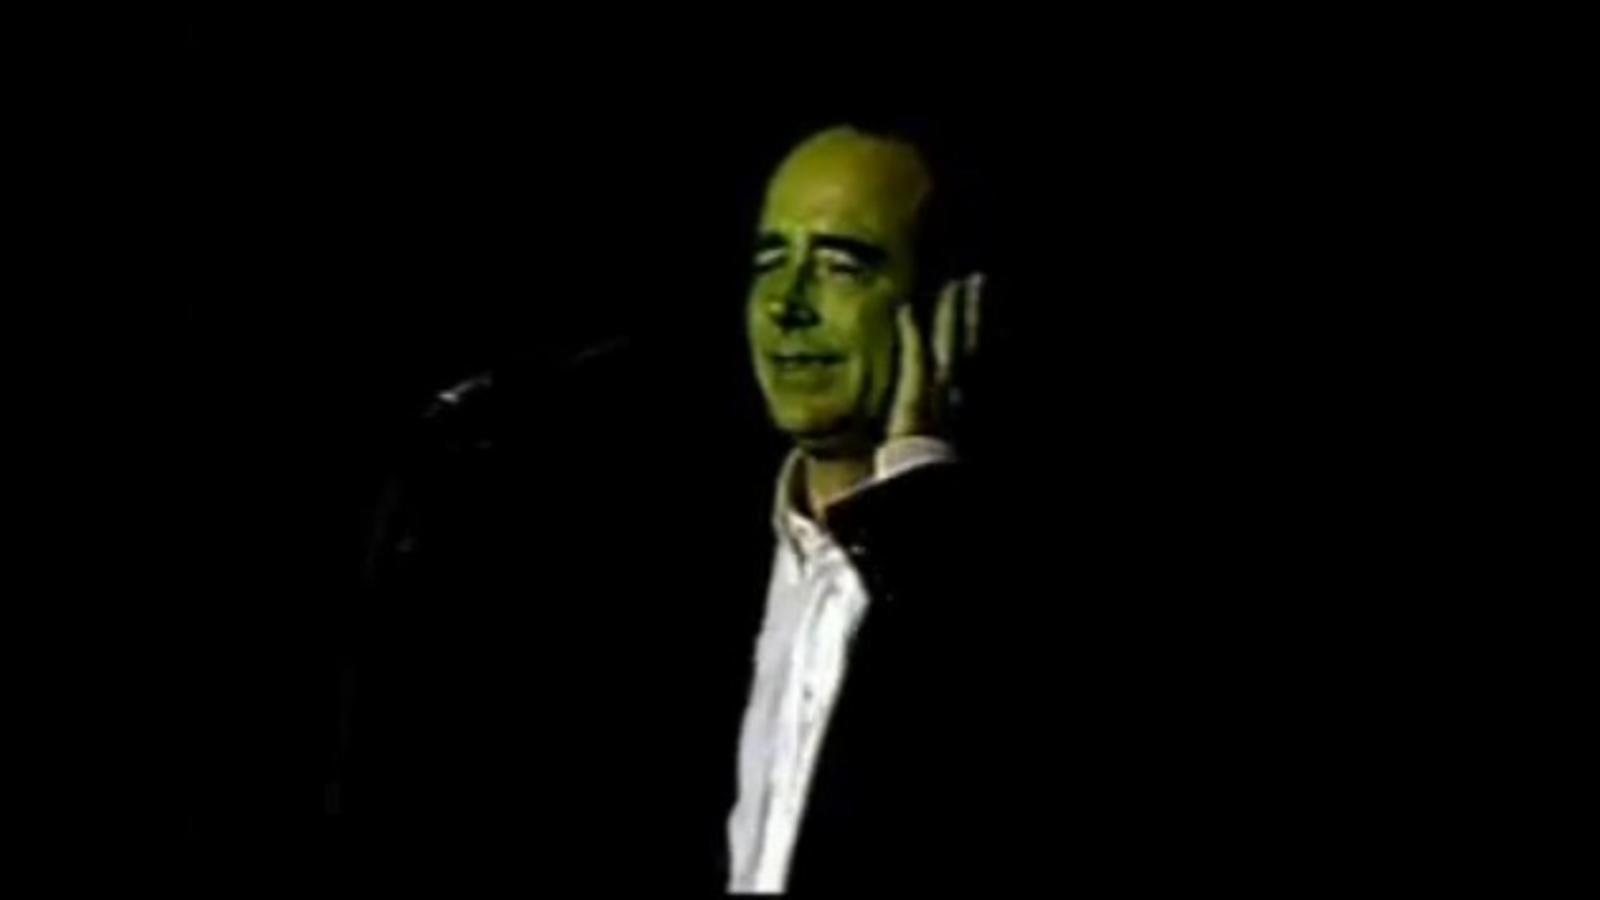 Serrat canta 'Penélope', escrita per Augusto Algueró